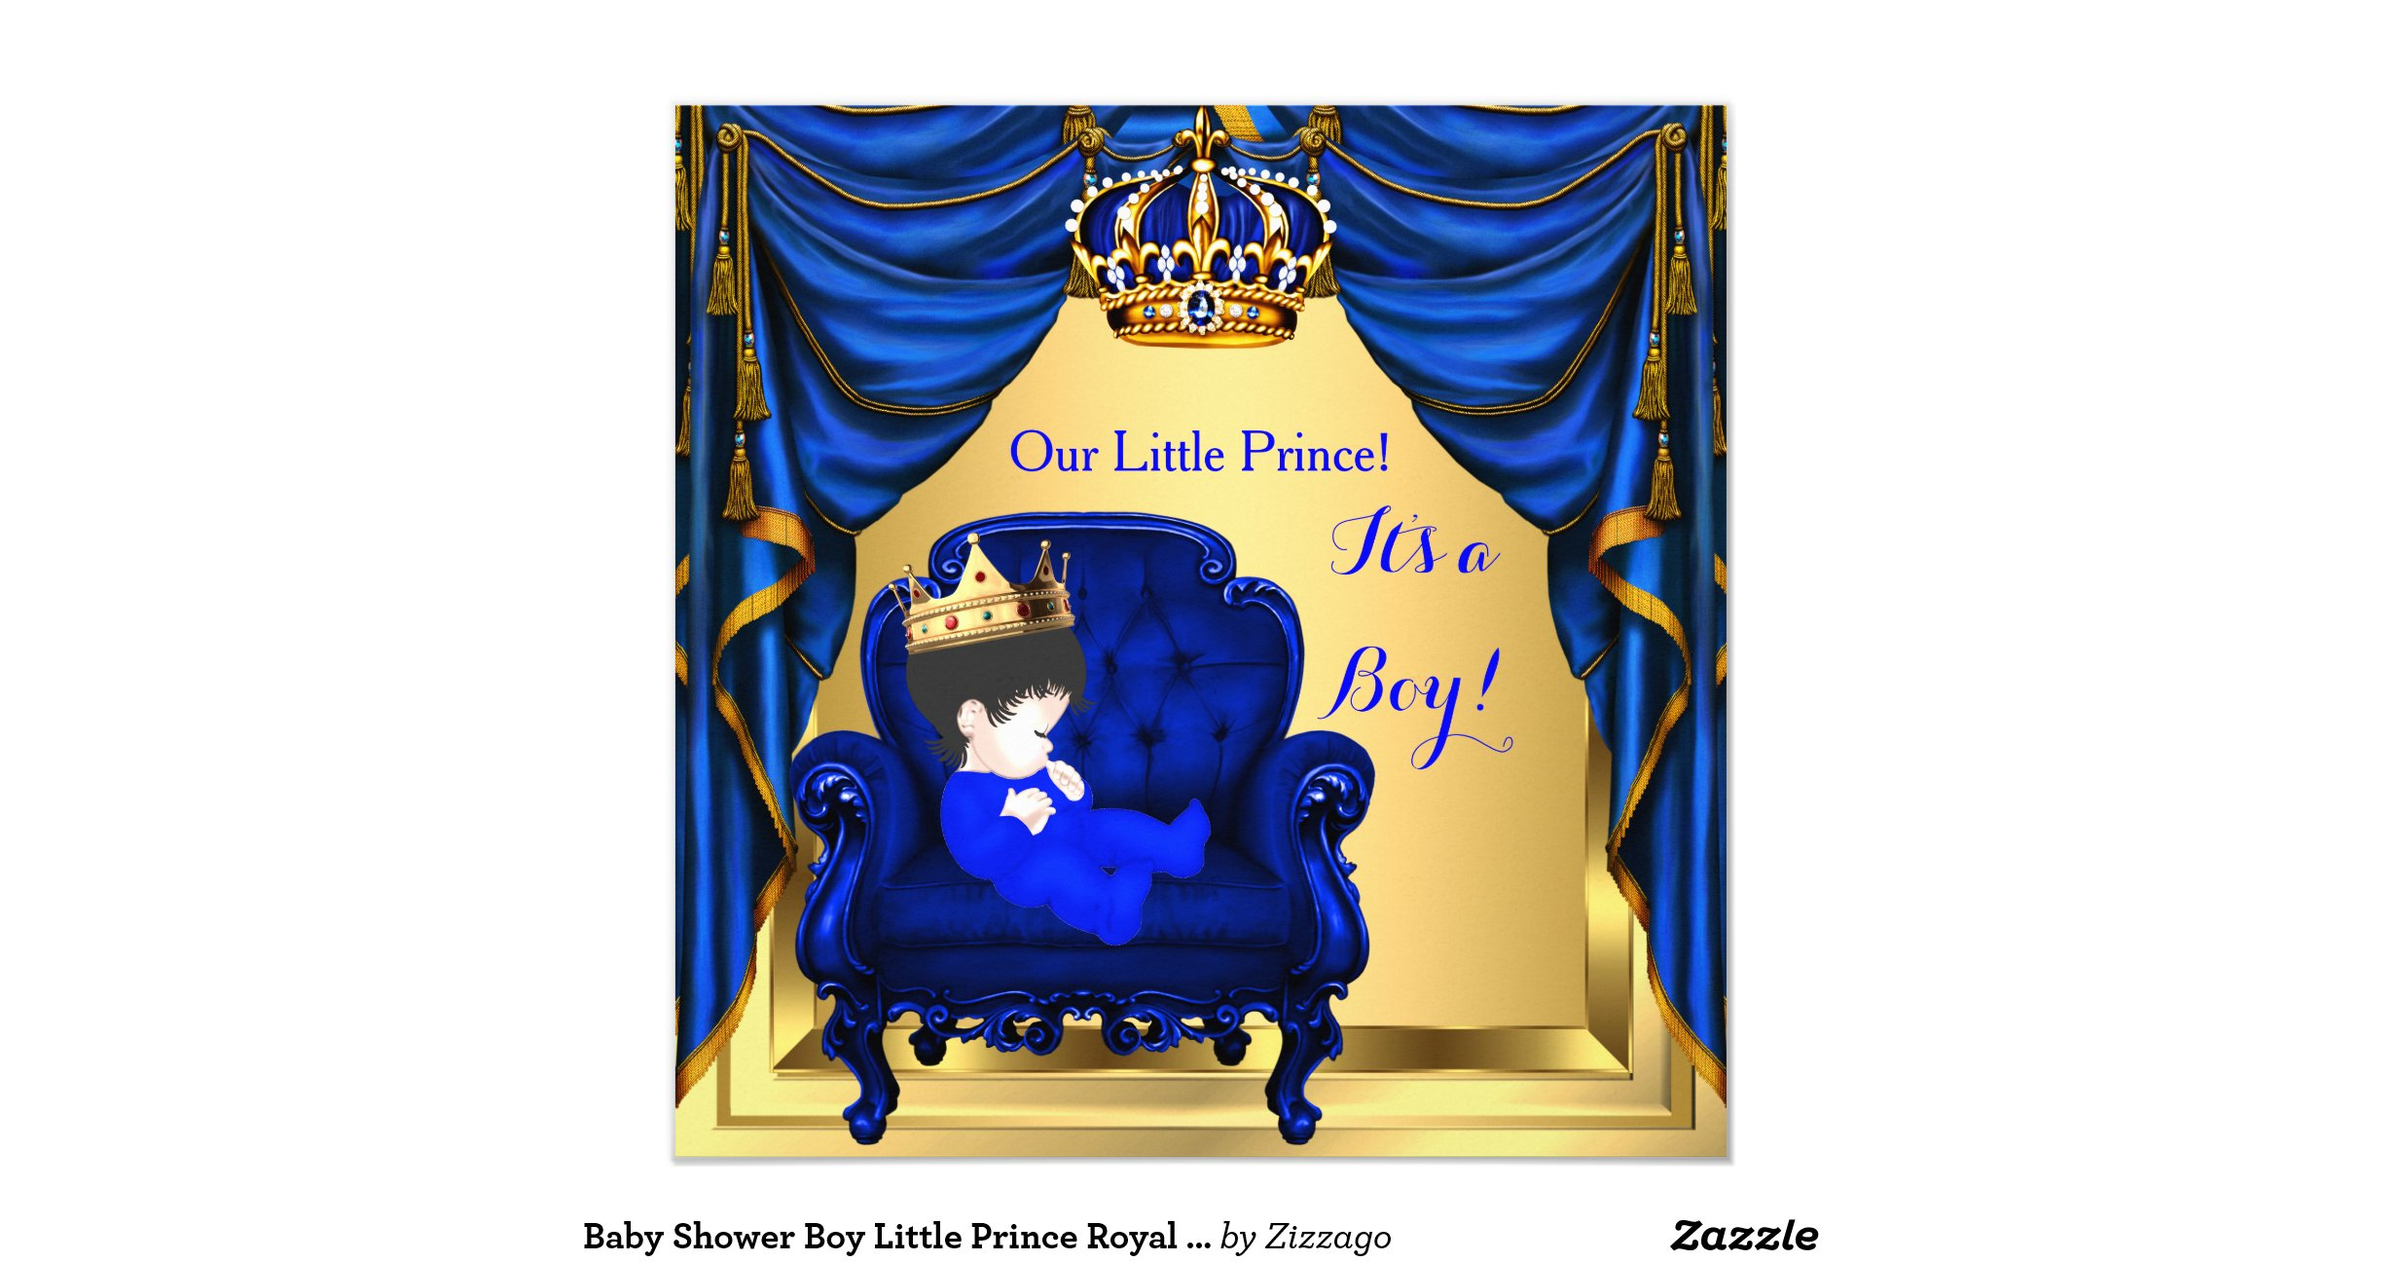 baby shower boy little prince royal blue gold 2 invitation zazzle